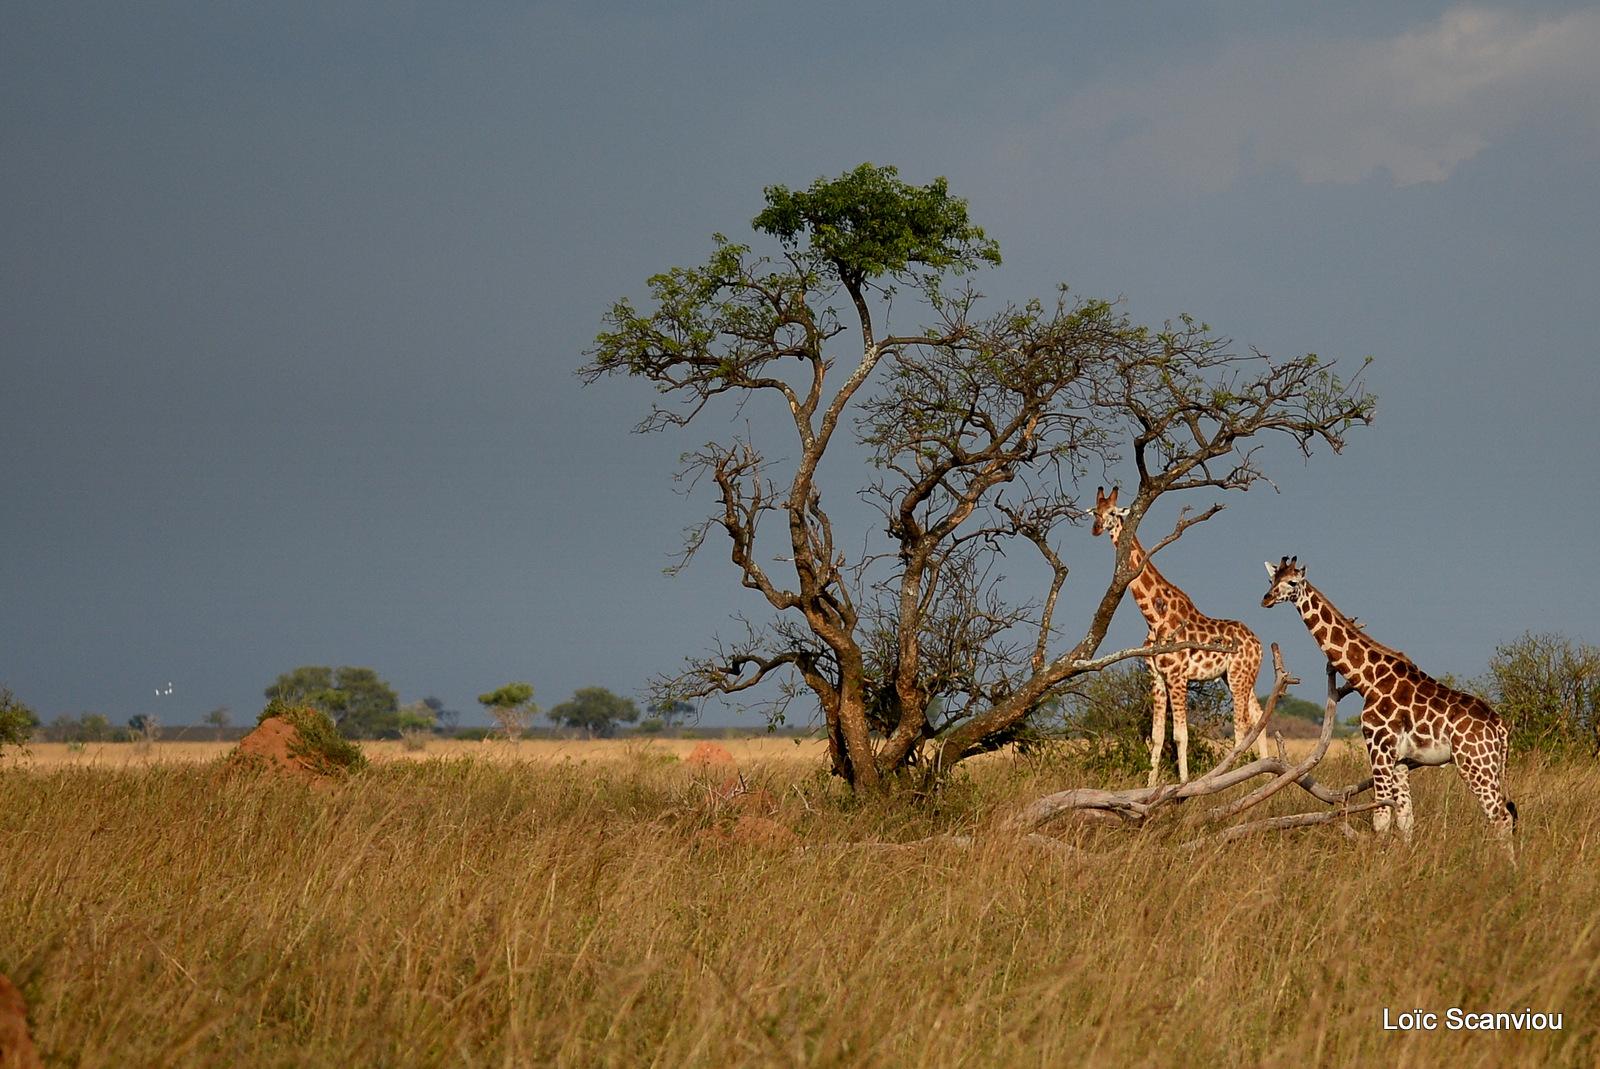 Girafe de Rothschild/Rothschild's Giraffe (15)